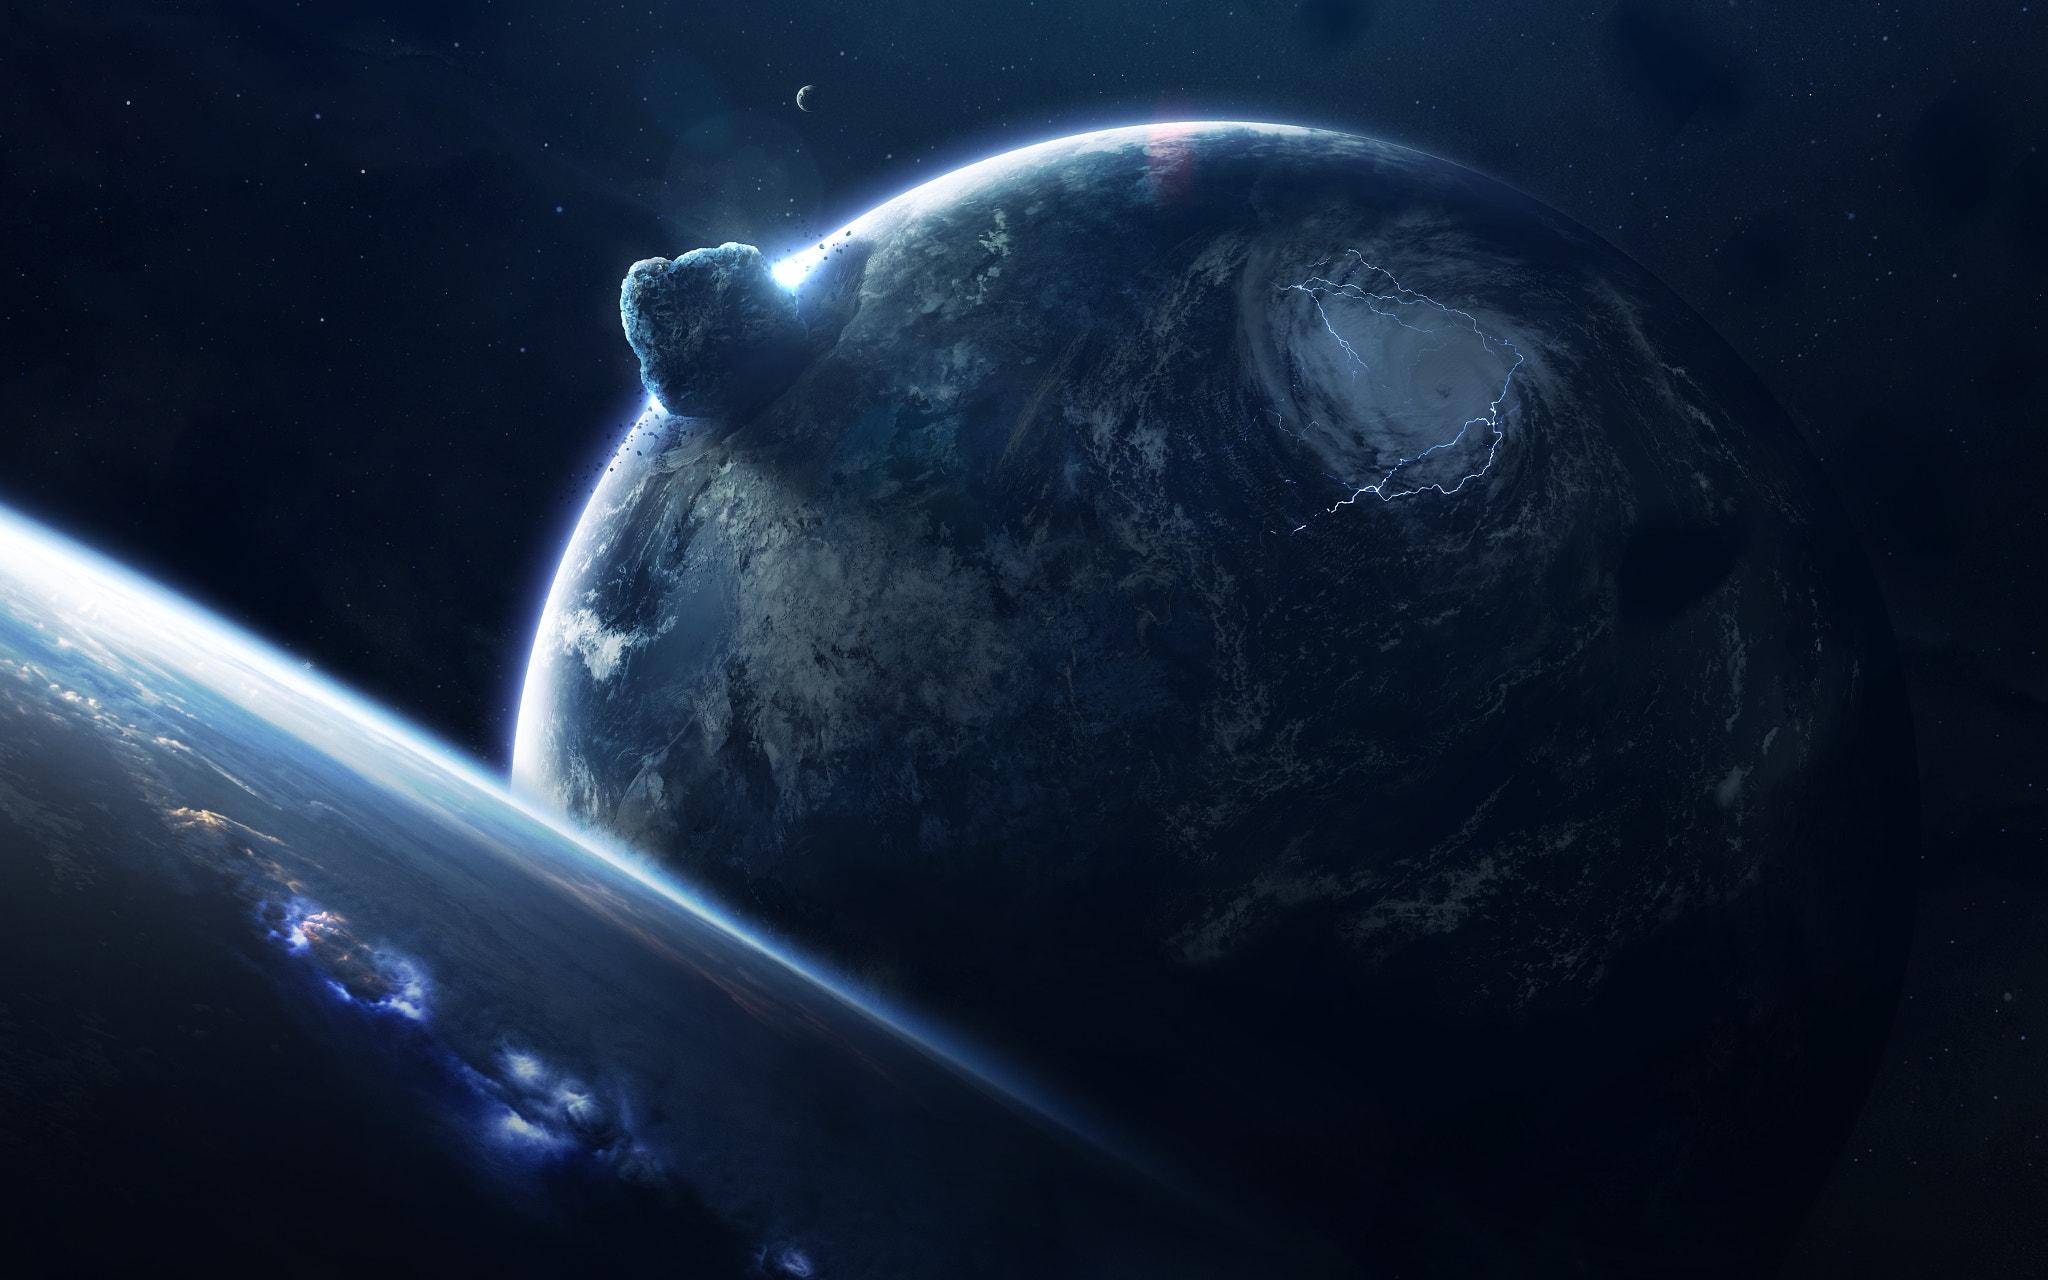 General 2048x1280 Vadim Sadovski 500px space art space digital art planet